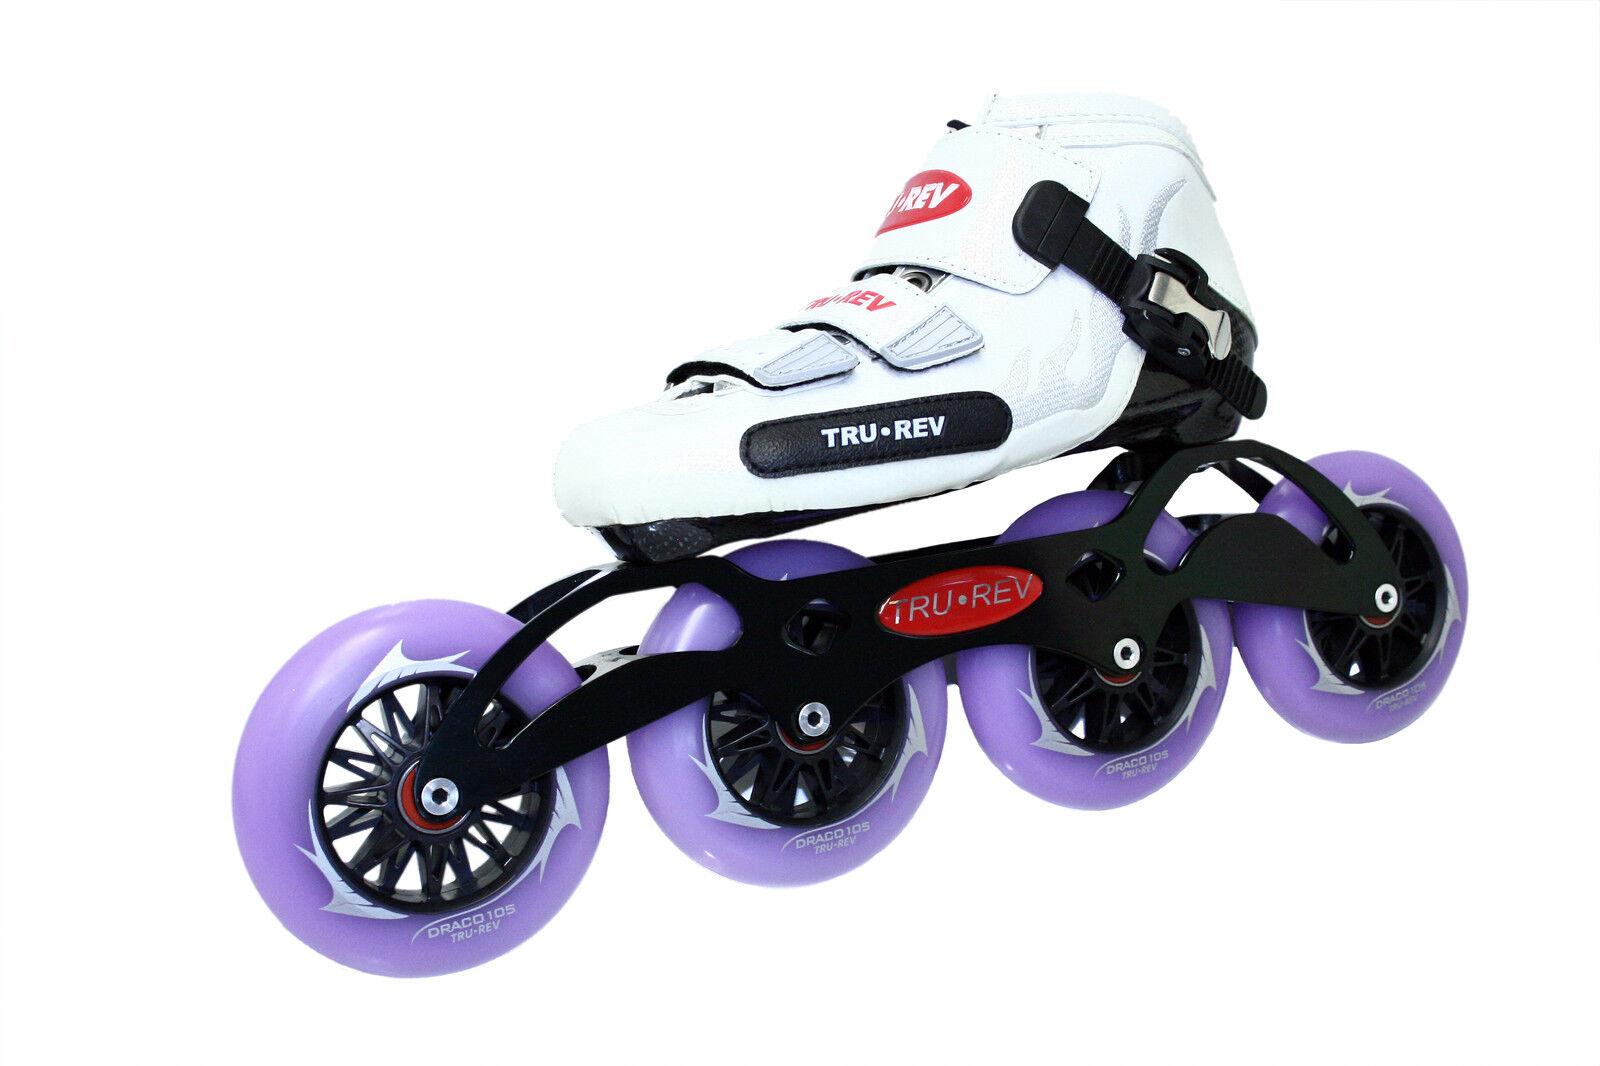 Inline Speed Skate by Trurev. 105mm wheels, ceramic bearings. SIZE 7.5